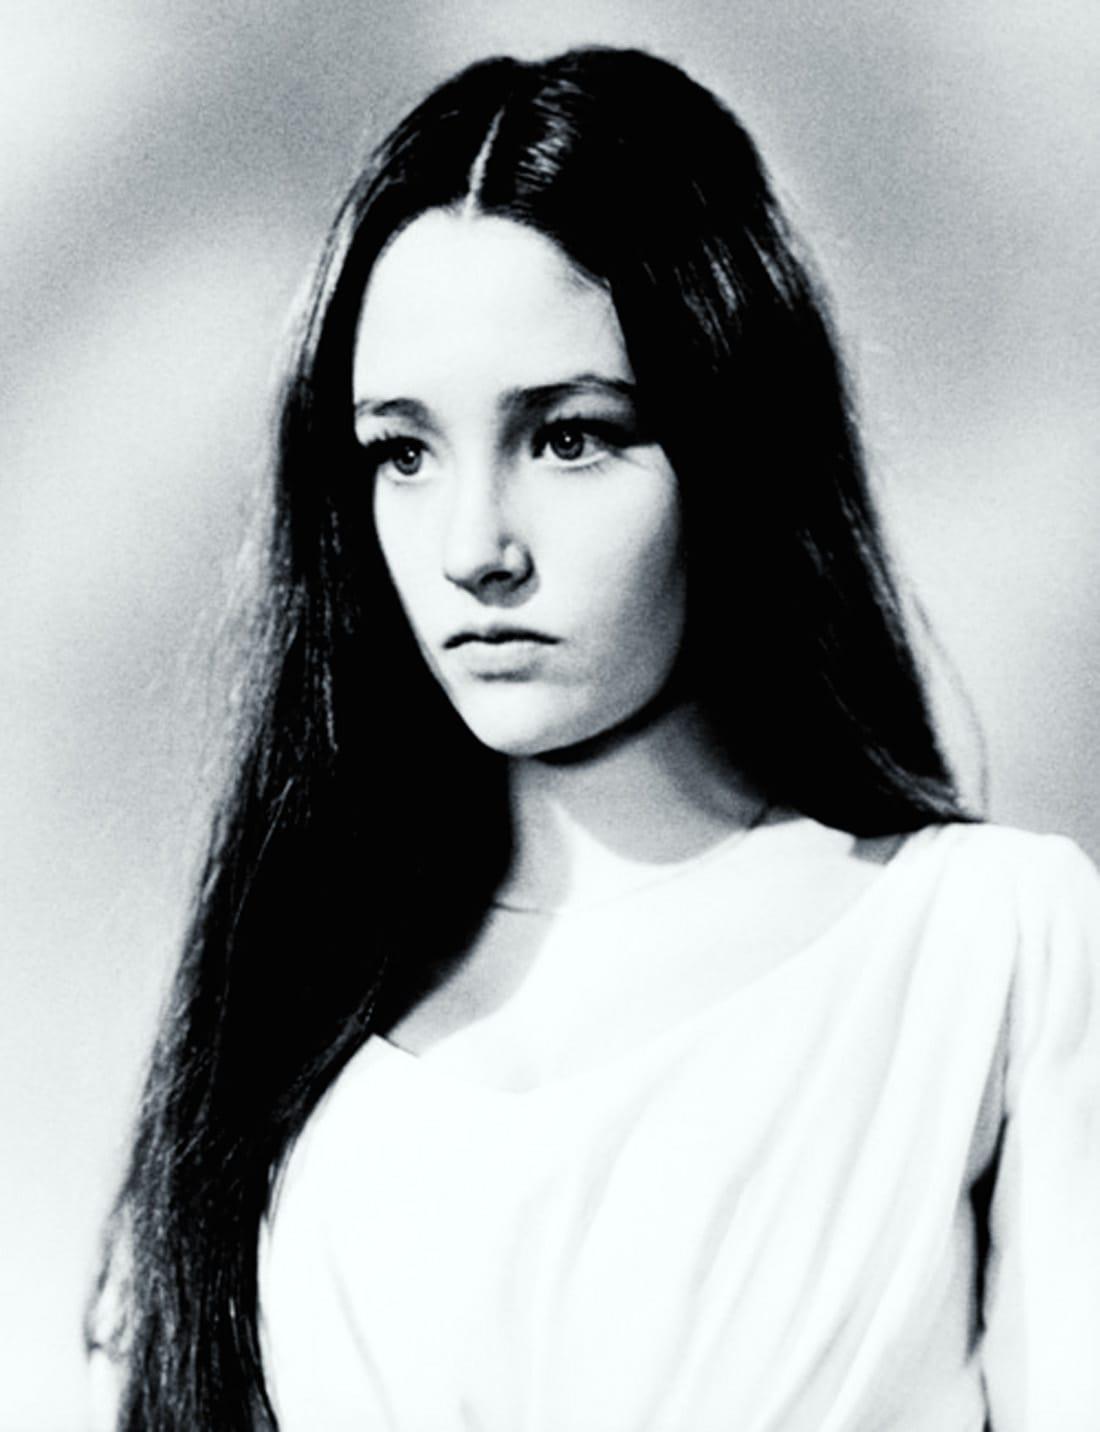 Picture of Olivia Hussey Joseph Gordon Levitt Wiki